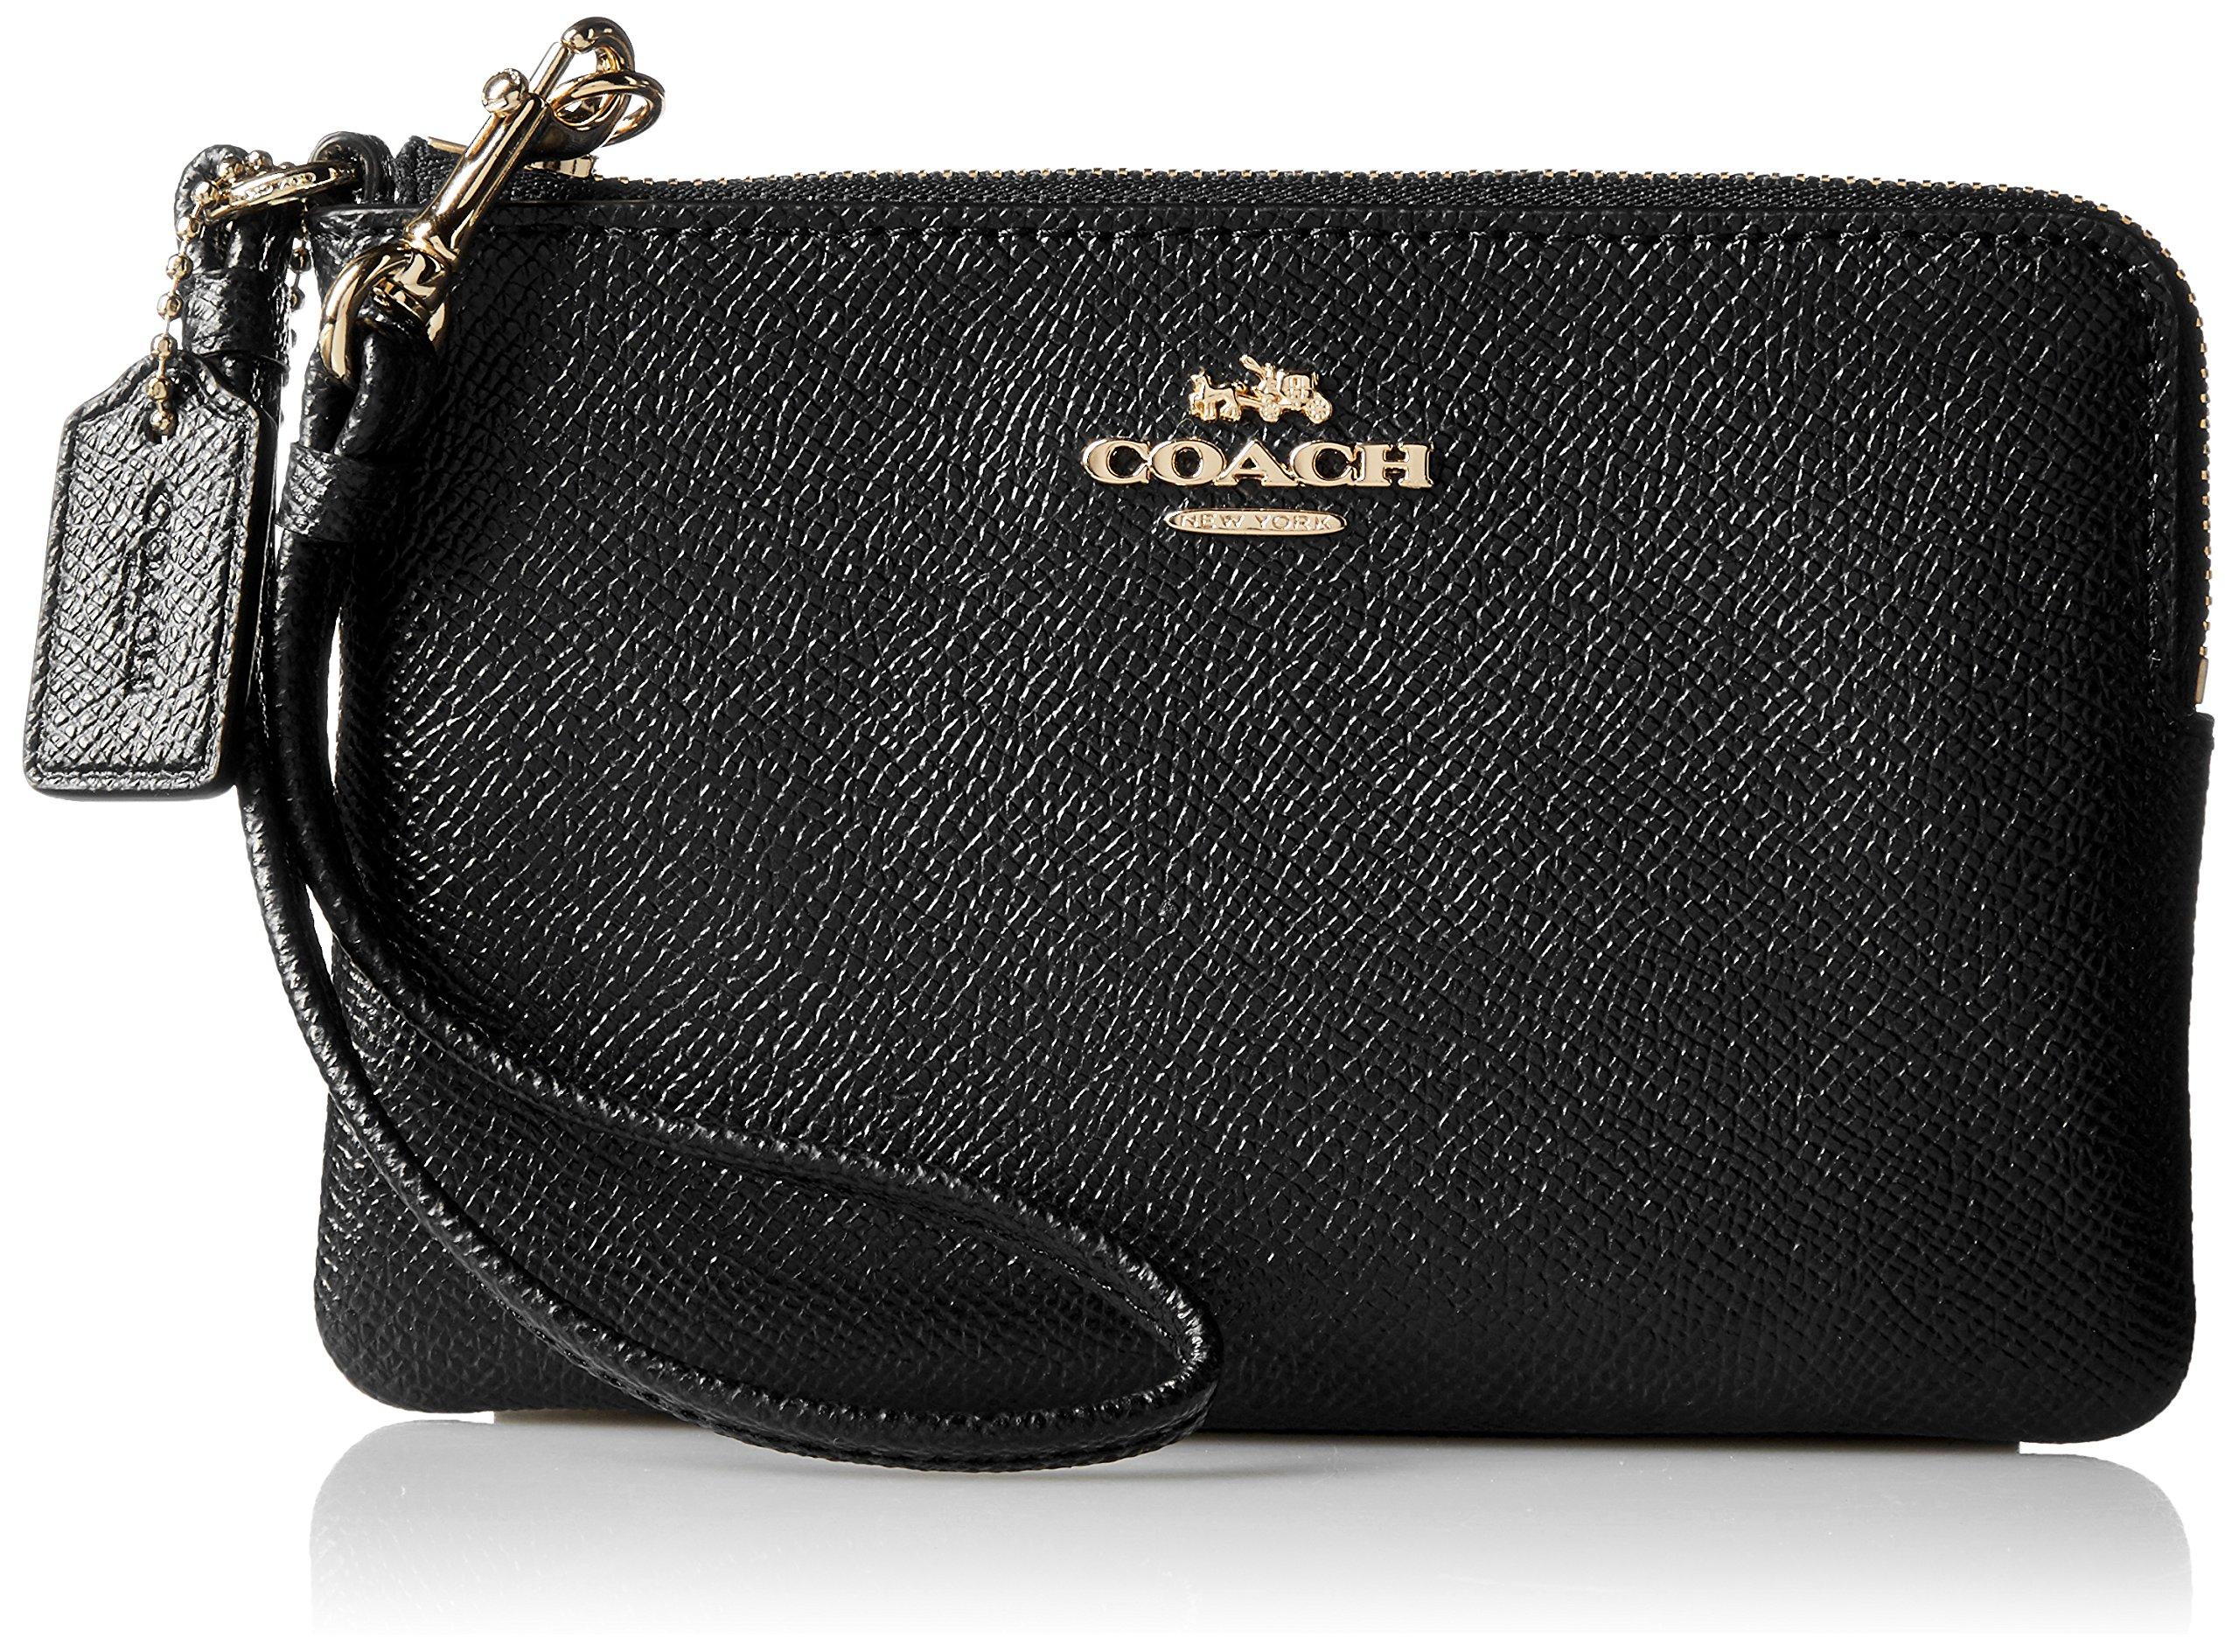 COACH Women's Crossgrain Leather Small Wristlet Li/Black Handbag